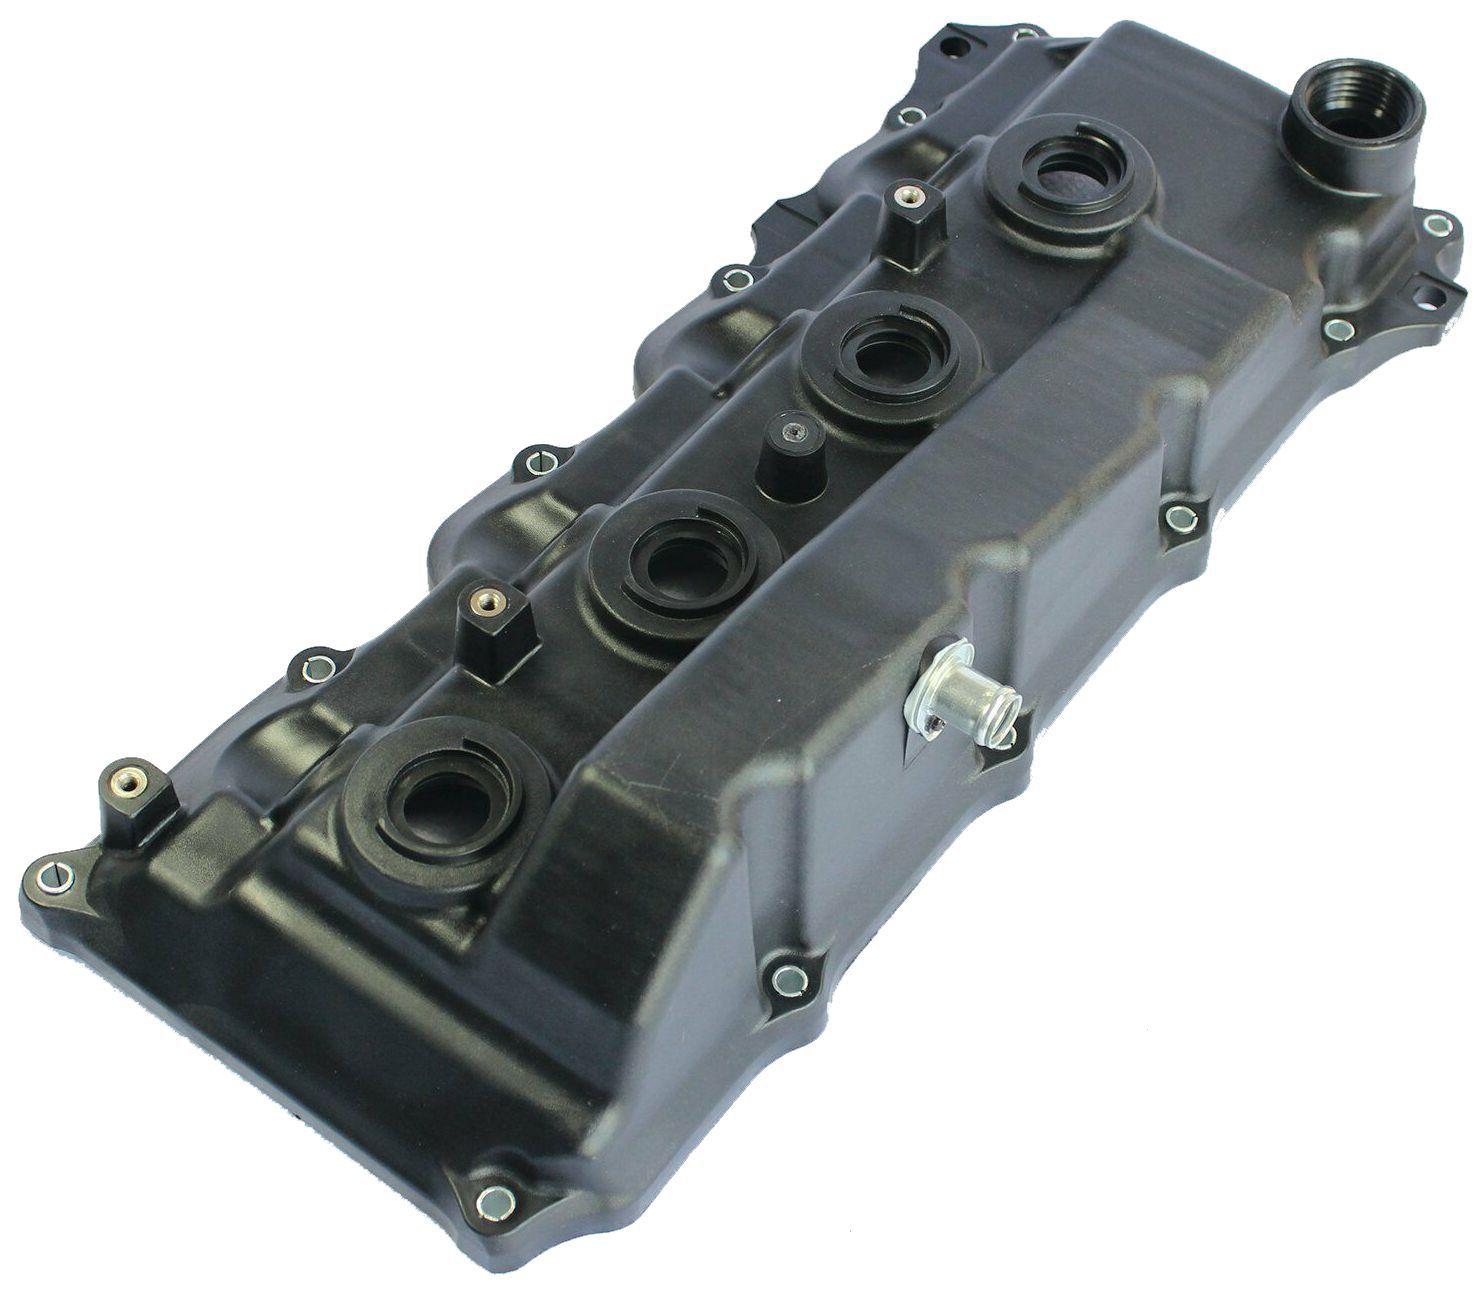 Tampa De Valvula motor Hilux 2.5 E 3.0 16v Turbo Diesel de 2005 à 2016